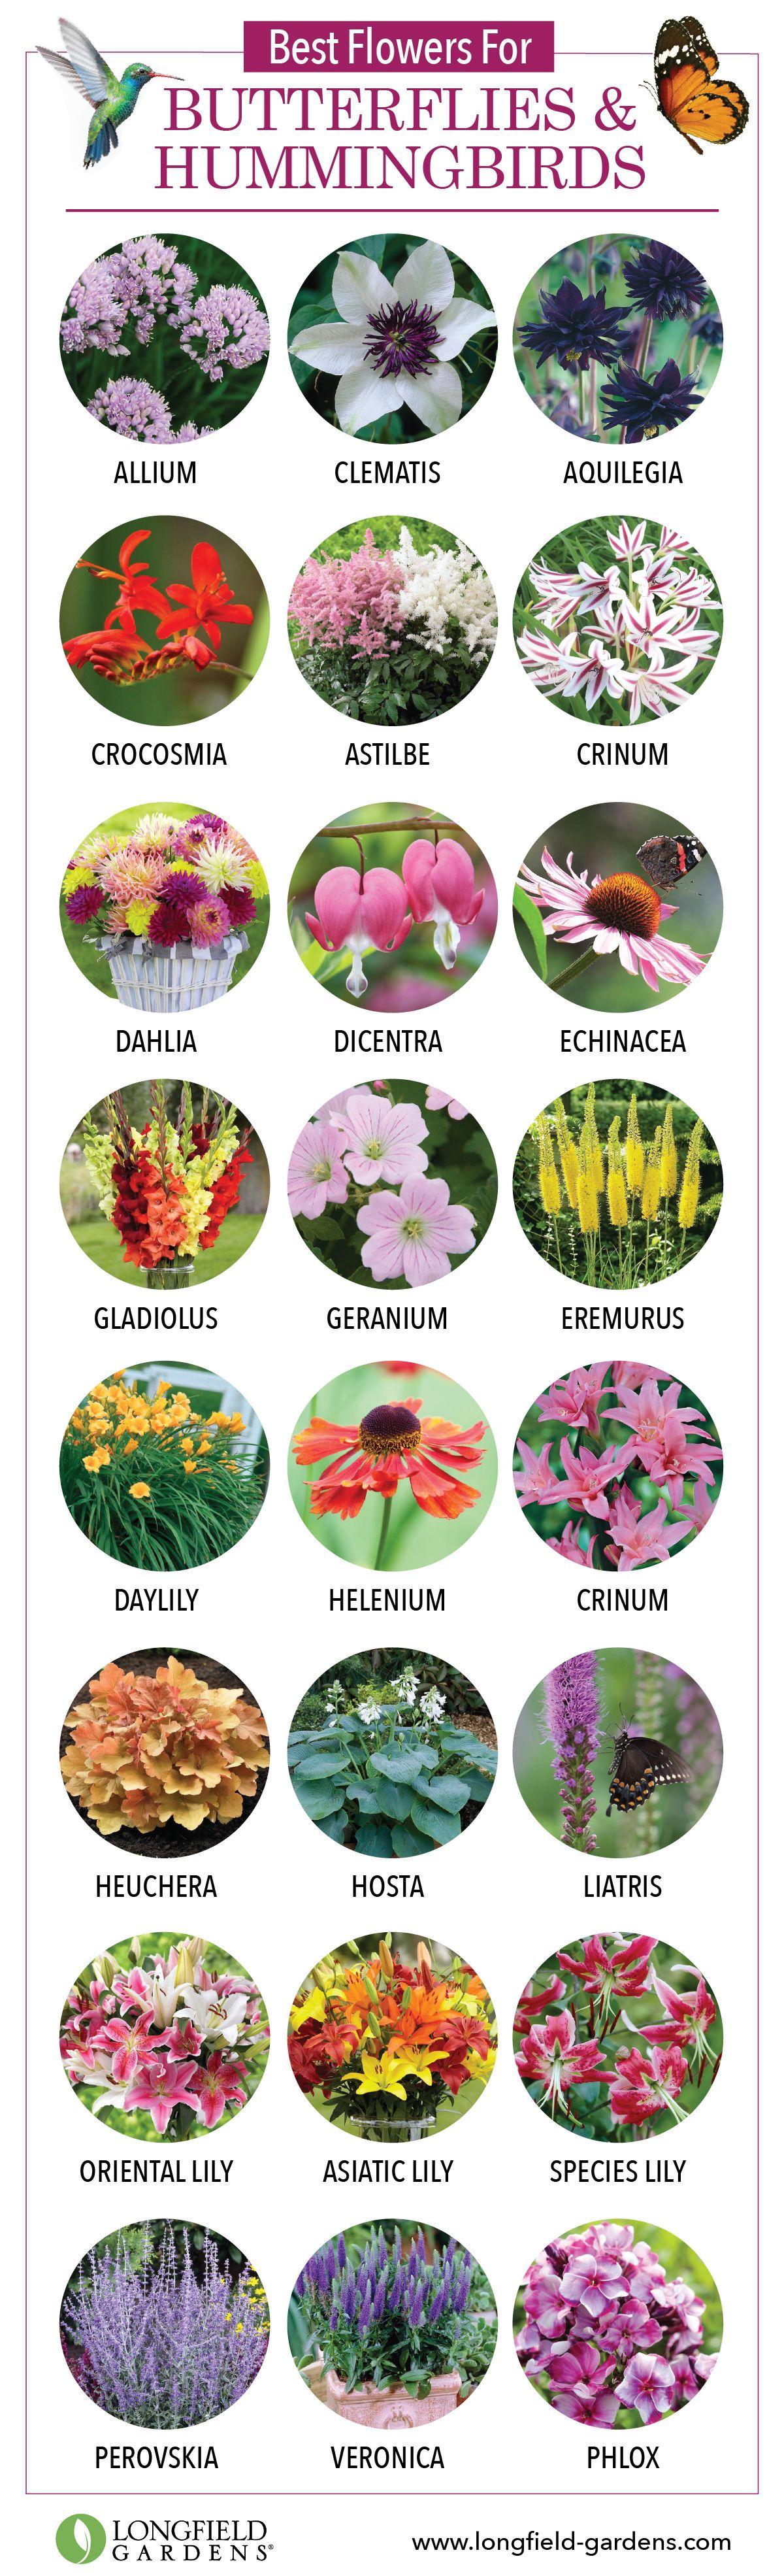 Best Flowers for Butterflies and Hummingbirds